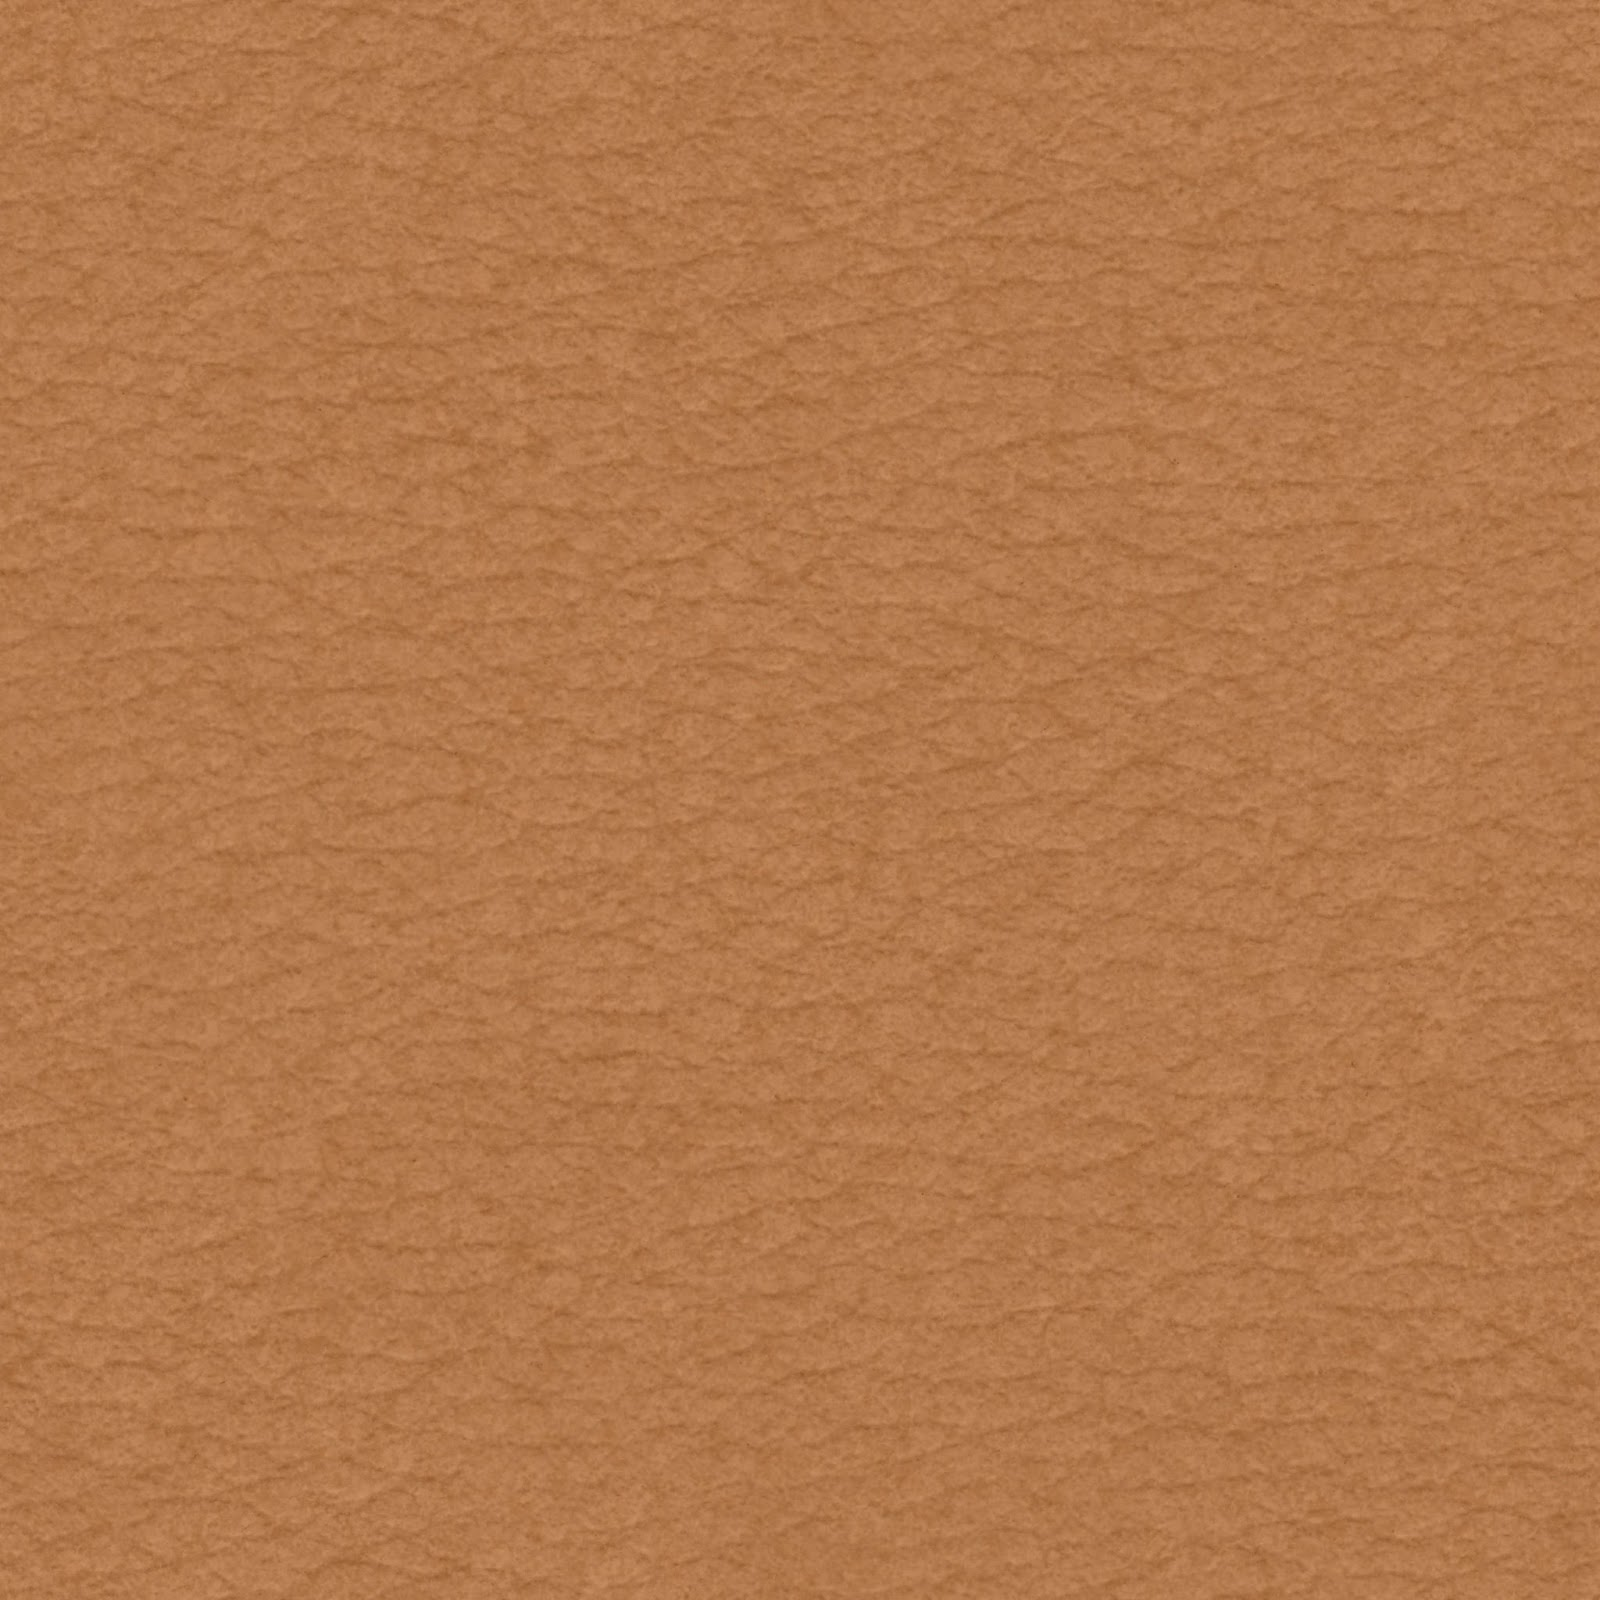 High Resolution Textures Tileable Human Skin Texture 4